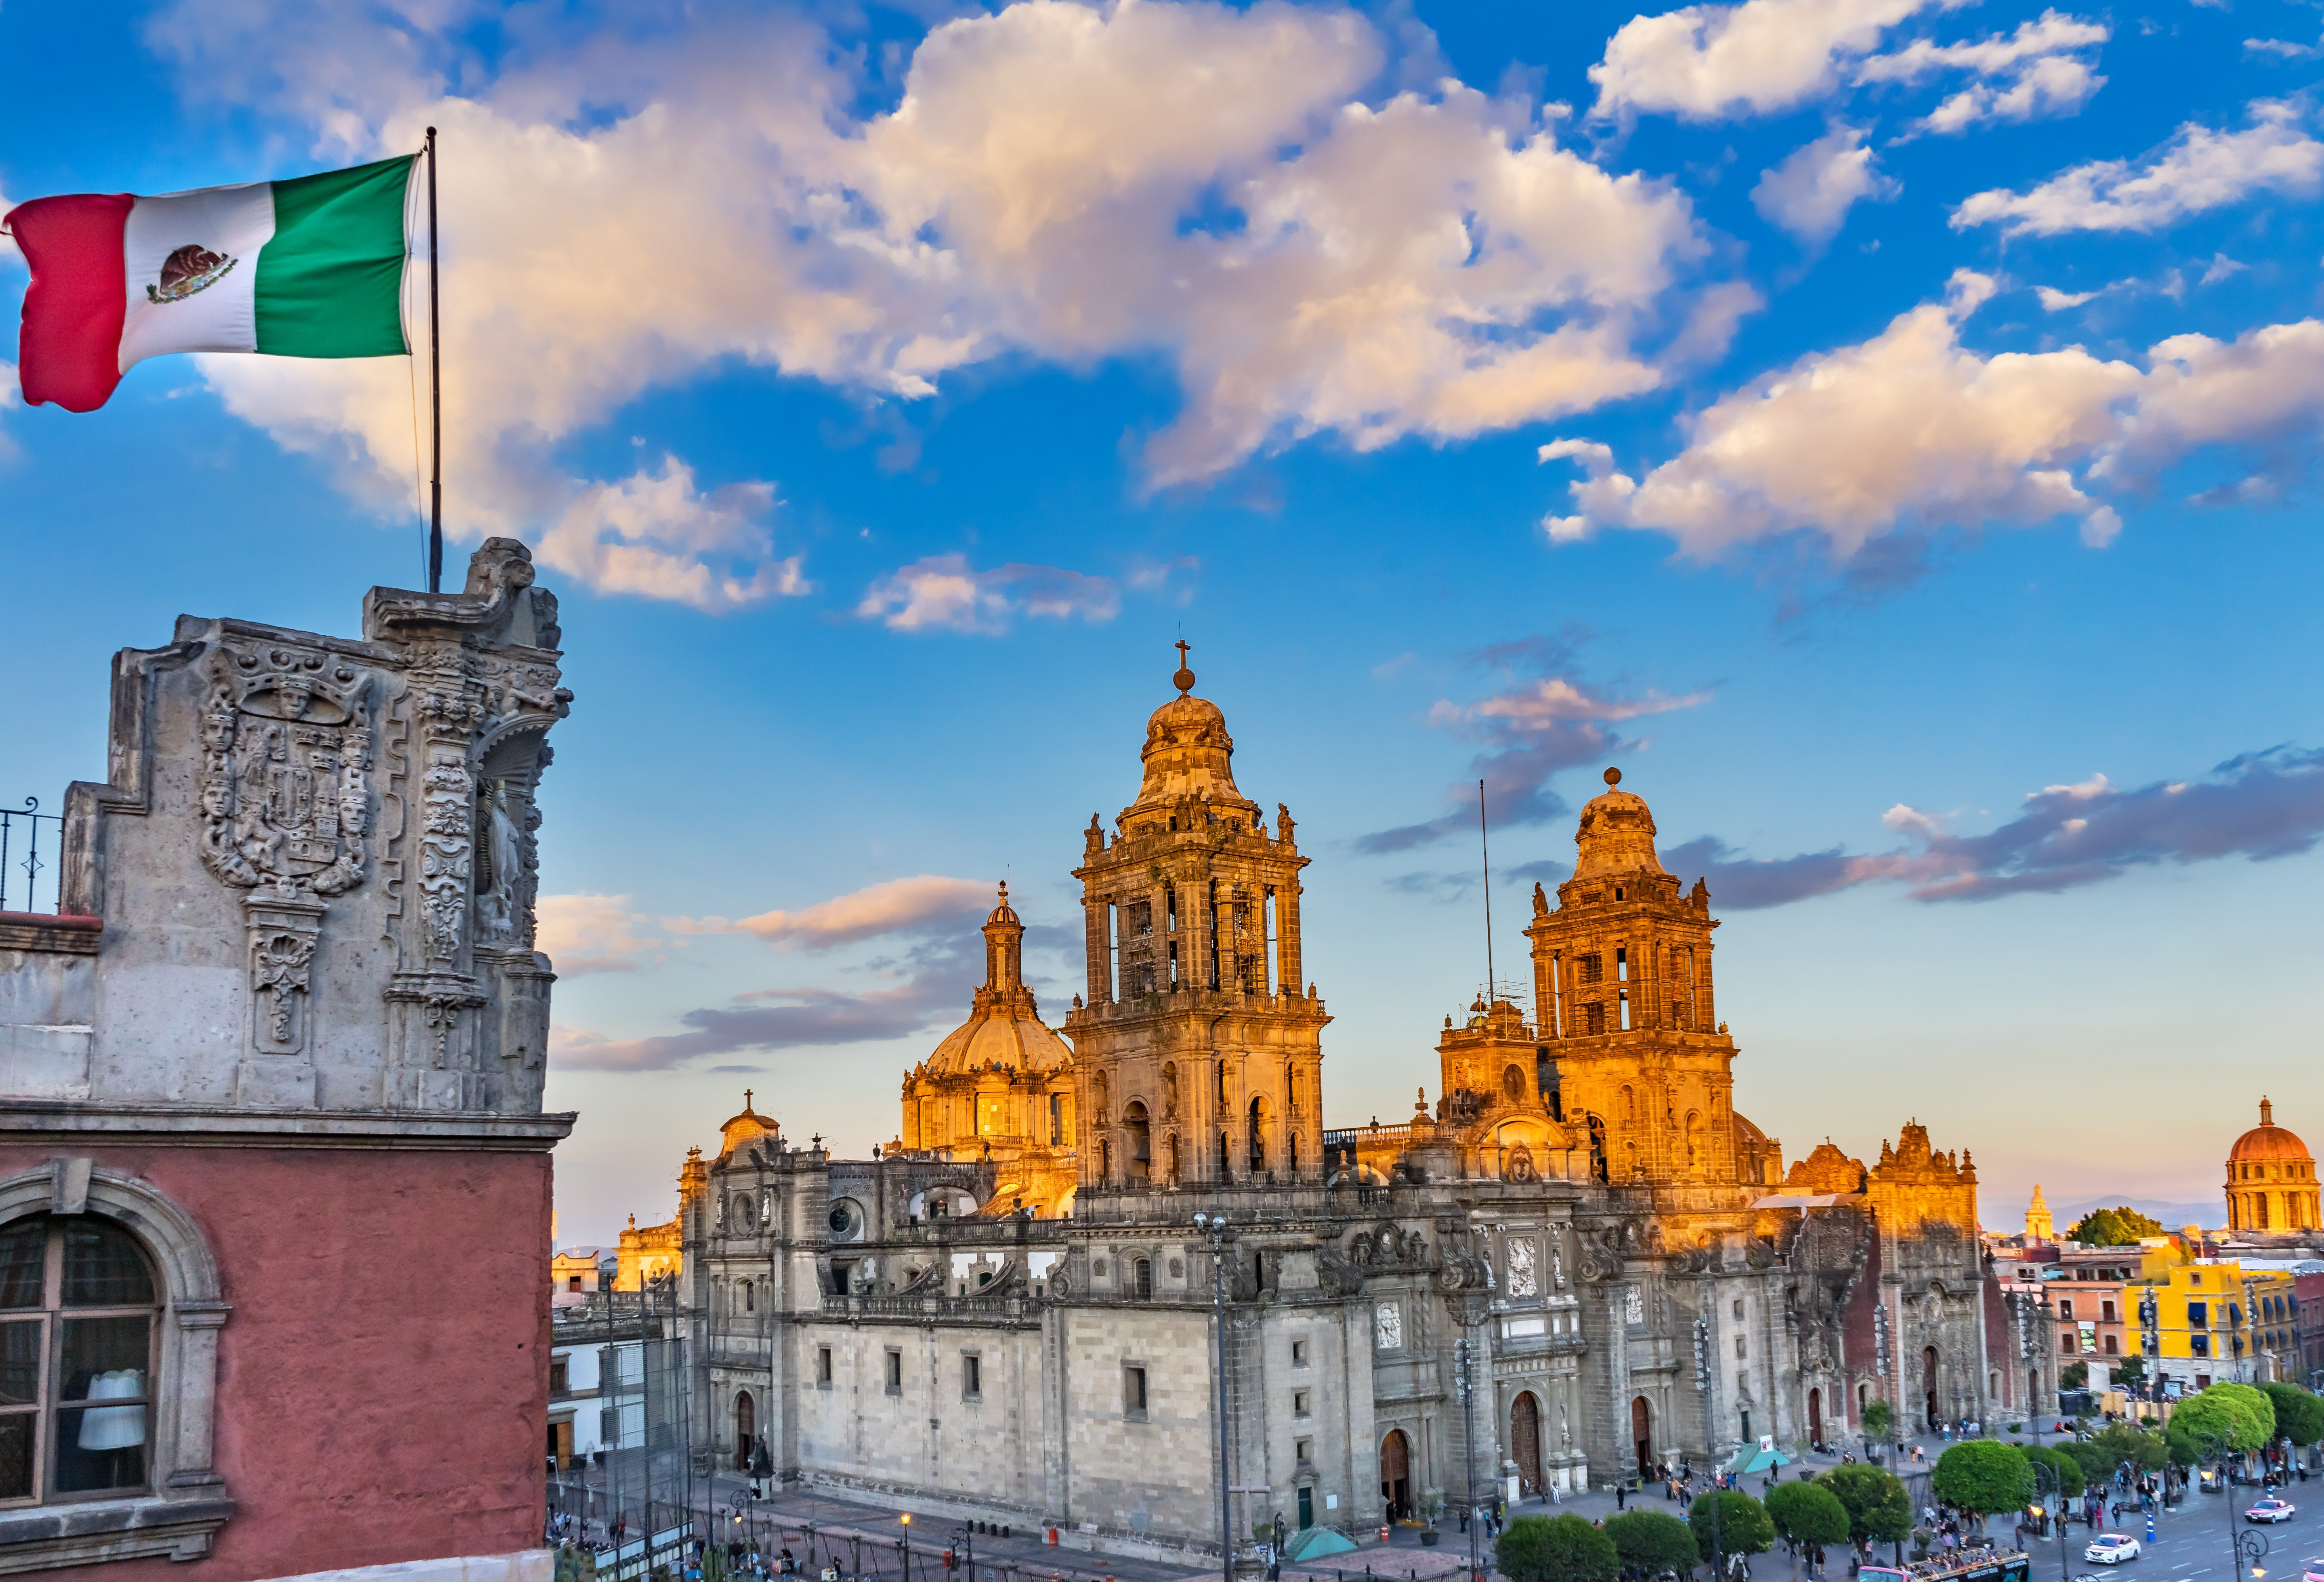 bigstock-Mexican-Flag-Metropolitan-Cath-281322370